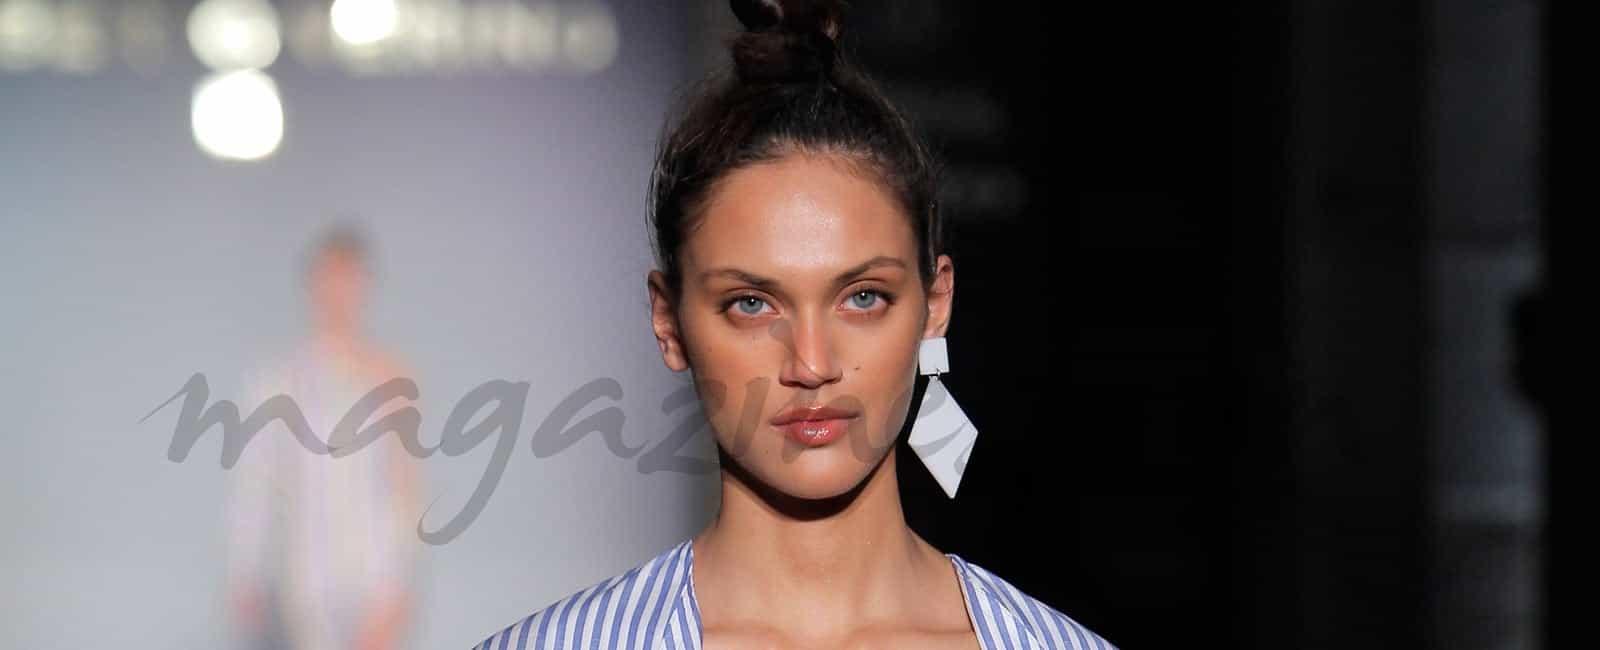 Mercedes Benz Fashion Week Madrid: Roberto Verino Primavera-Verano 2017